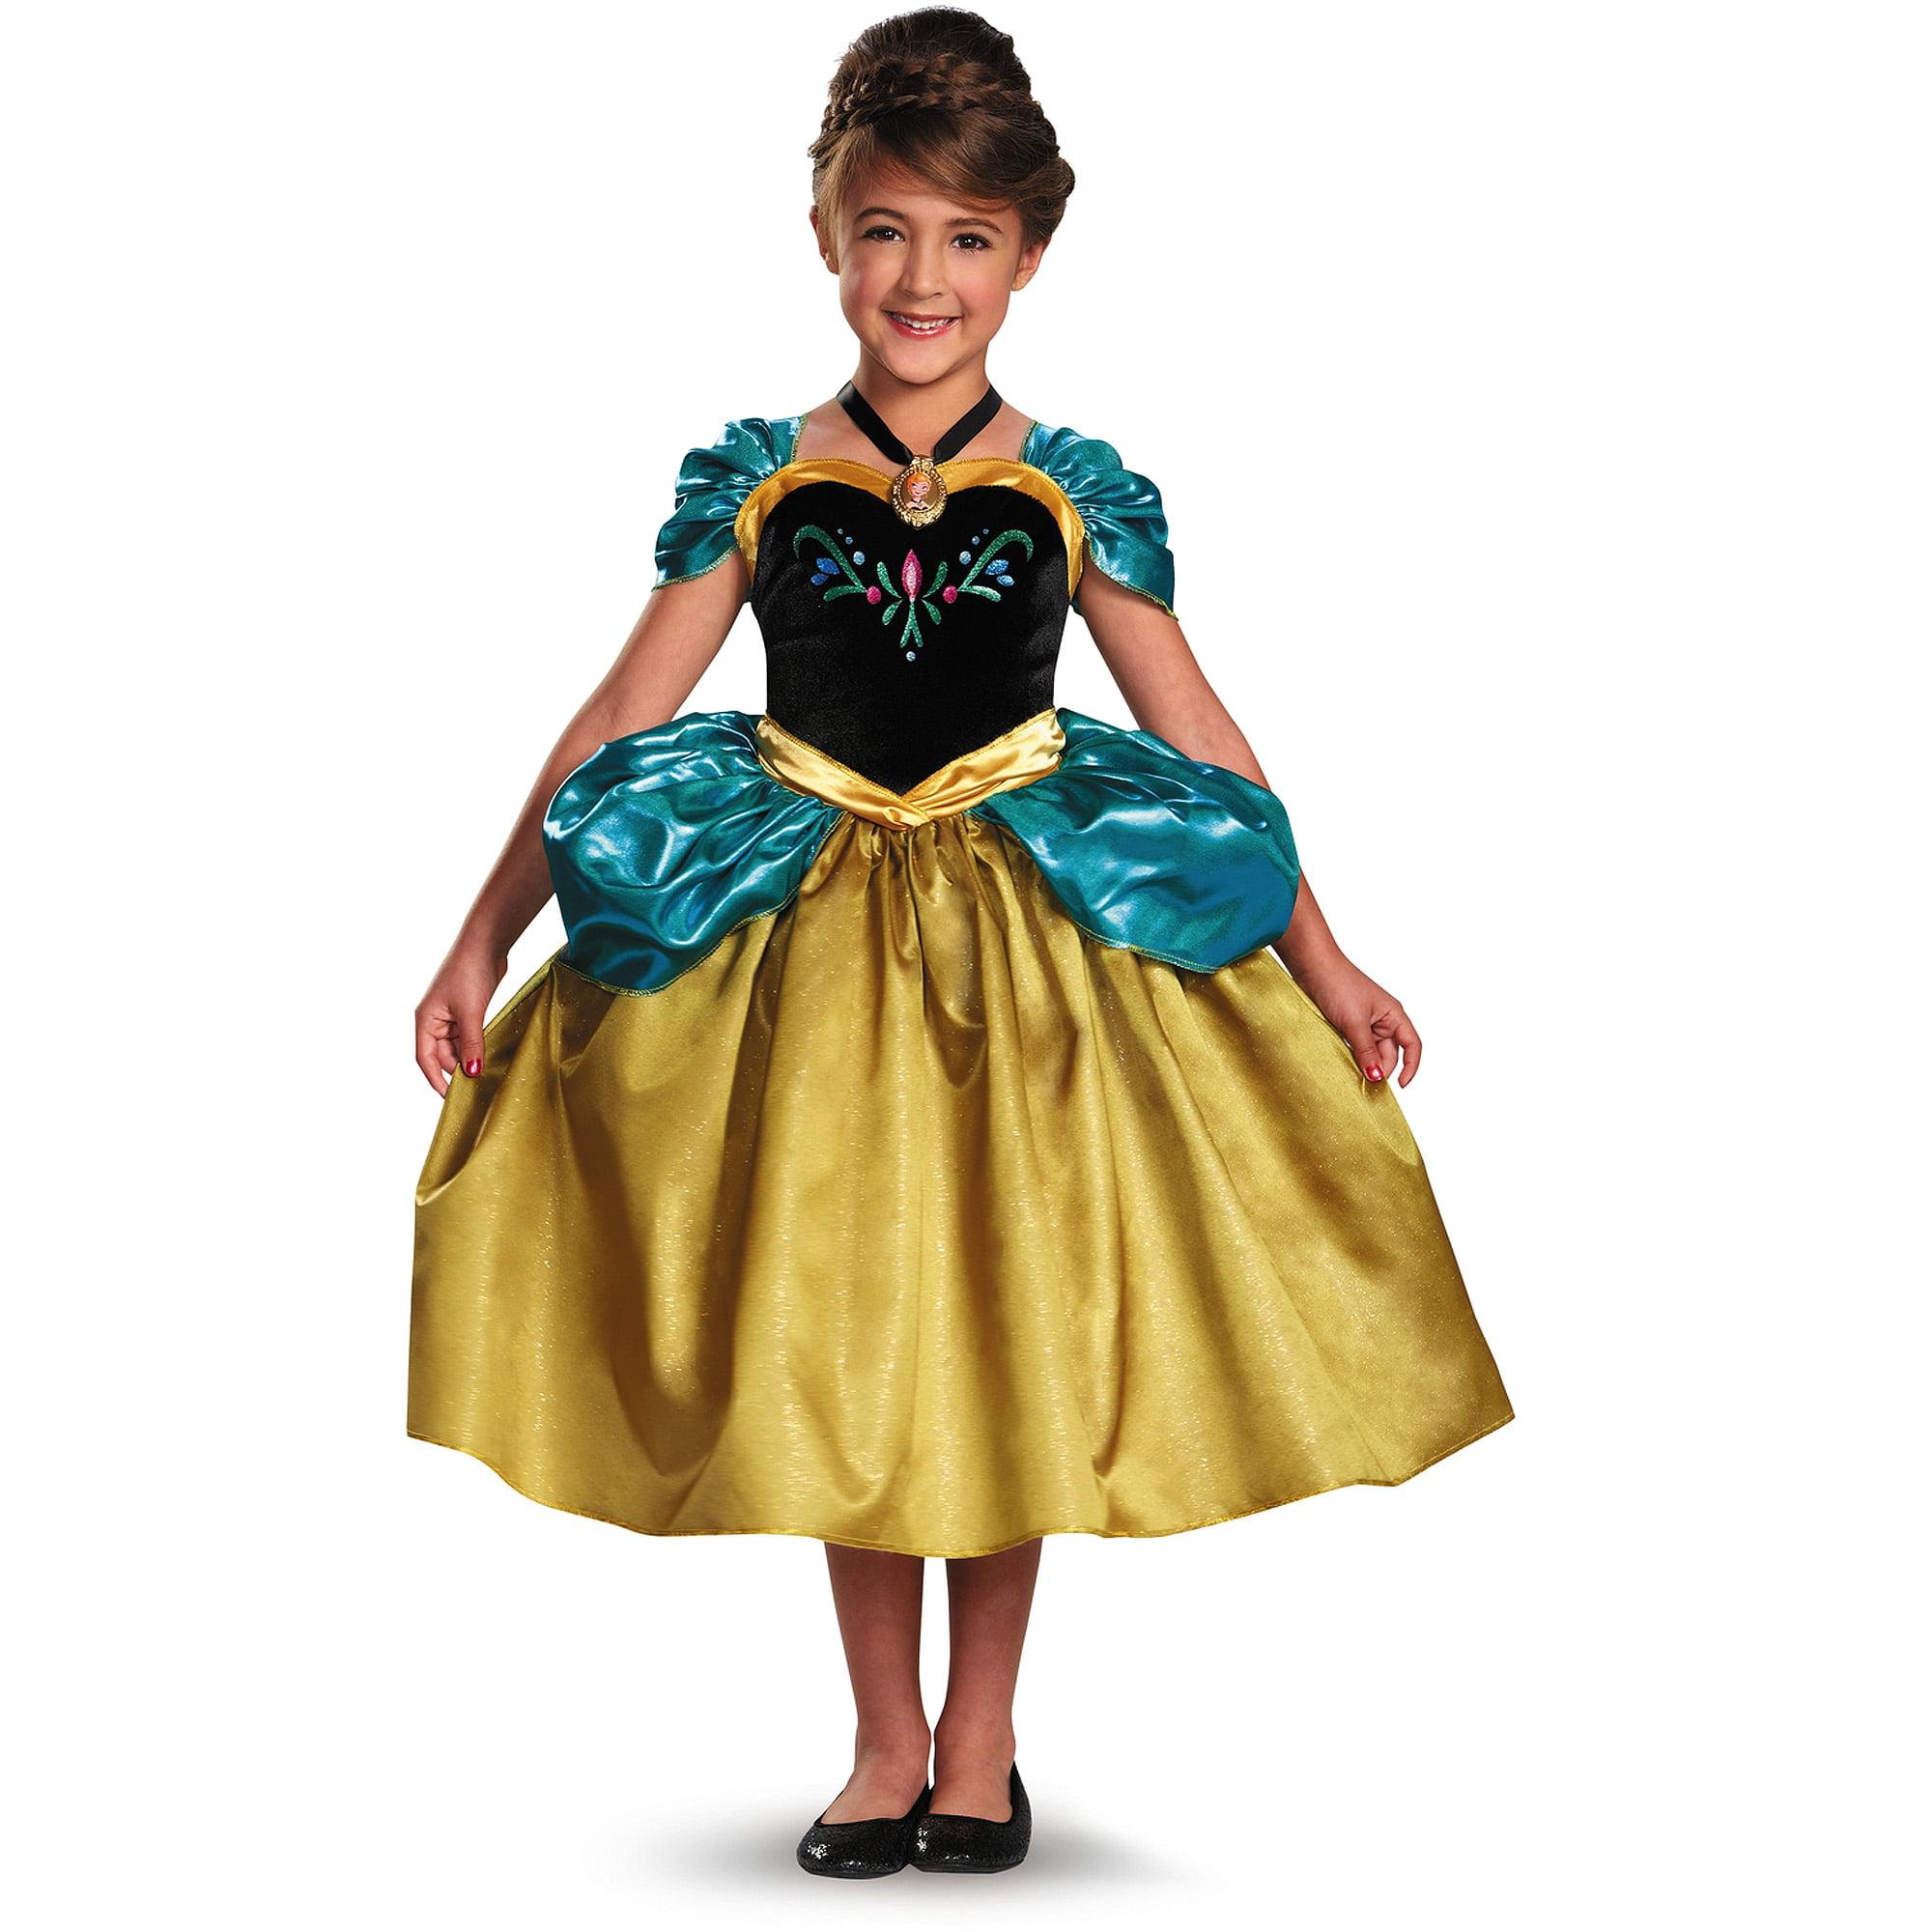 anna toddler halloween costume walmartcom - Halloween Anna Costume